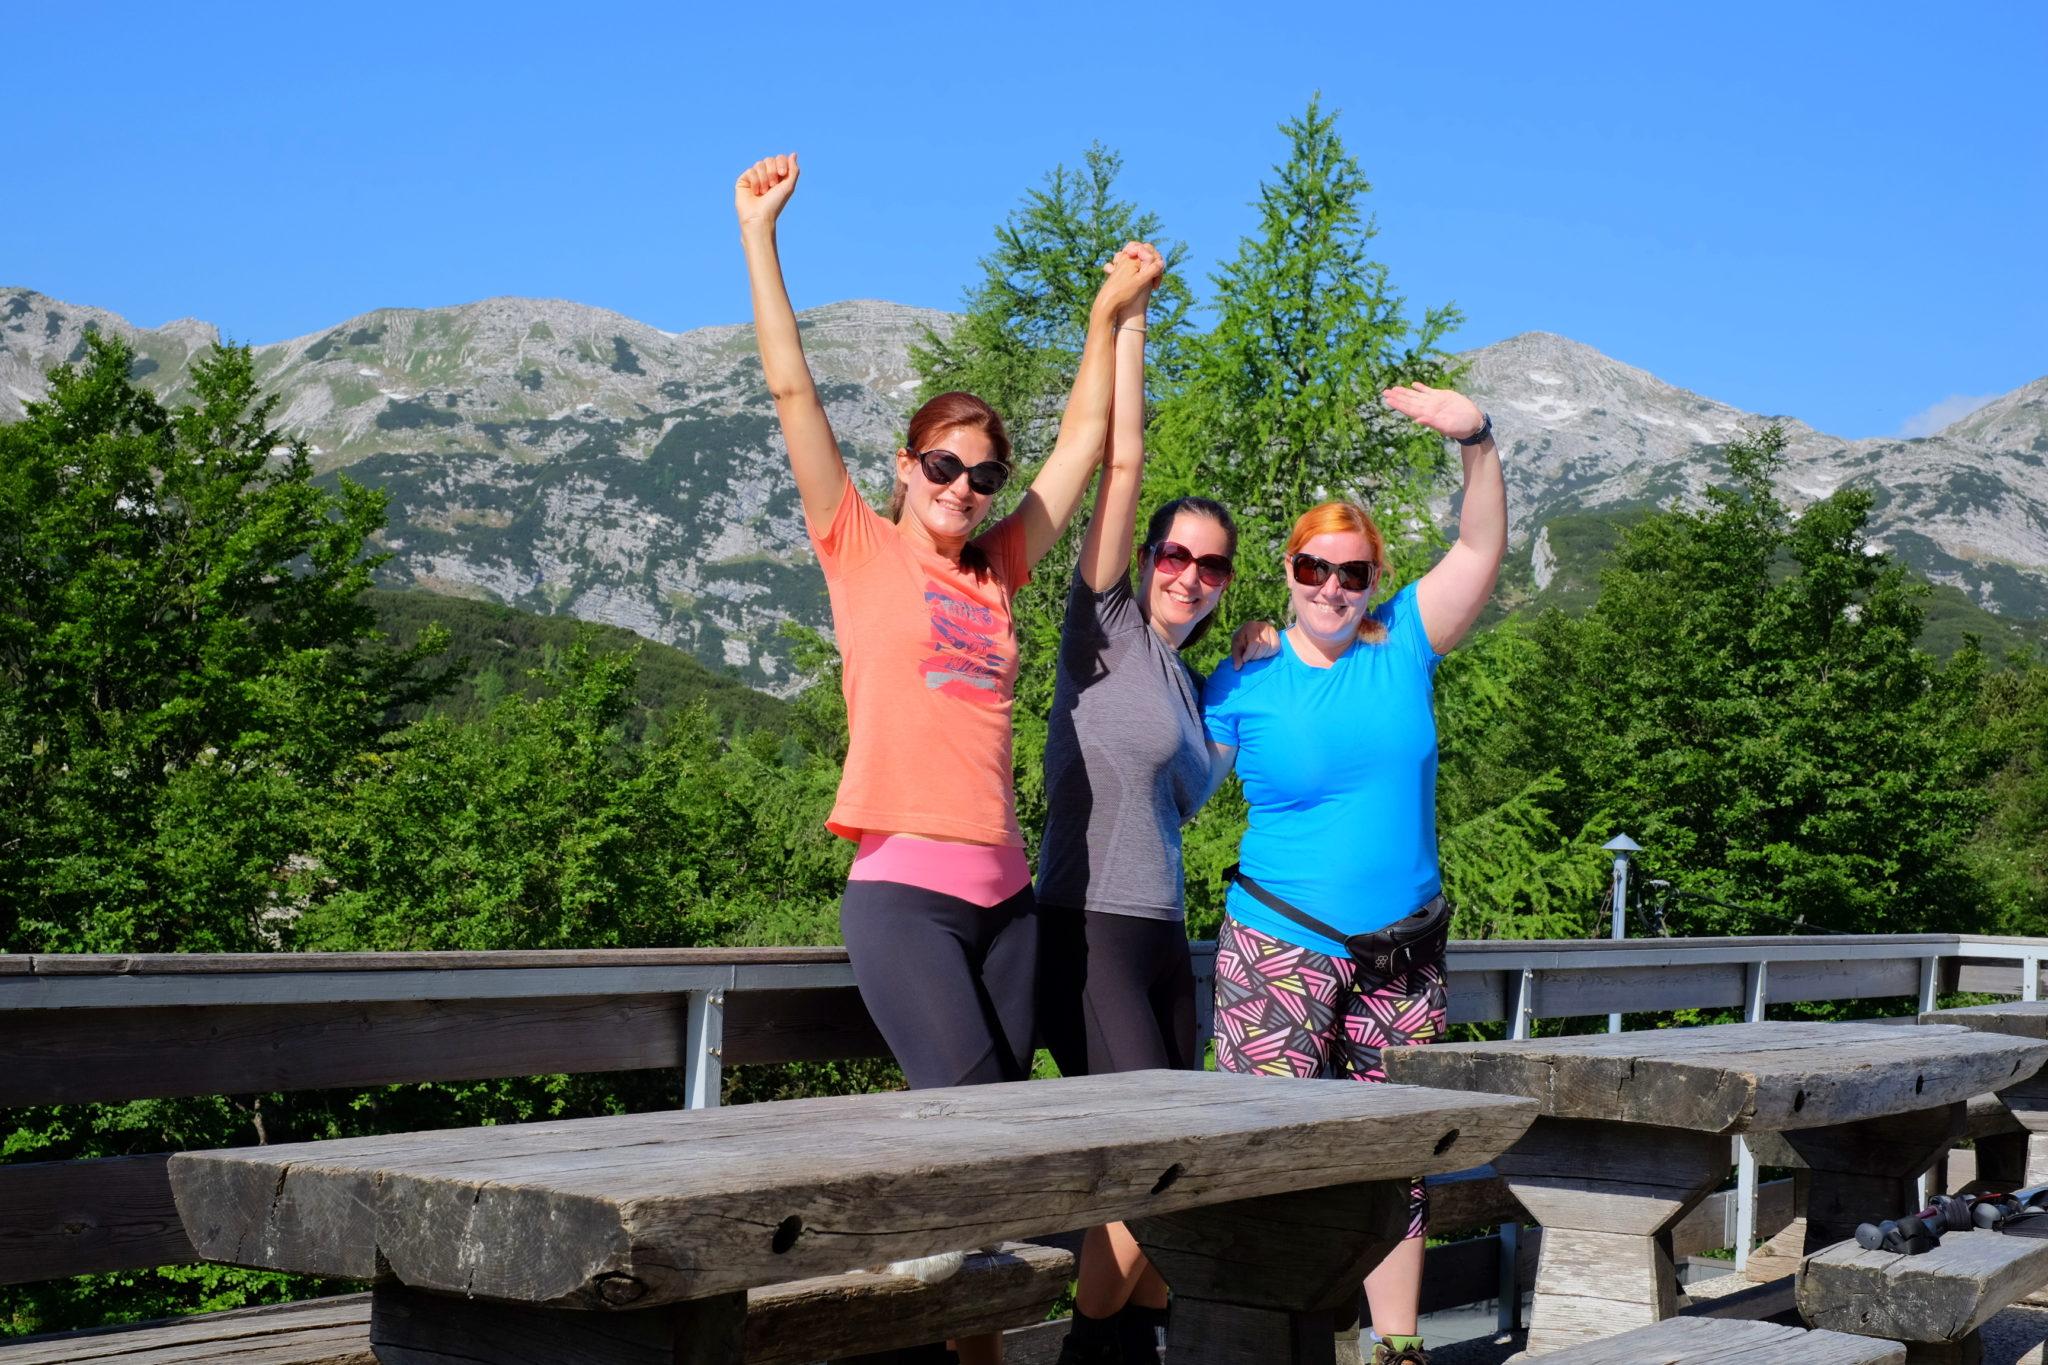 Three women hikers happy at the Komna hut, Julian Alps, Slovenia